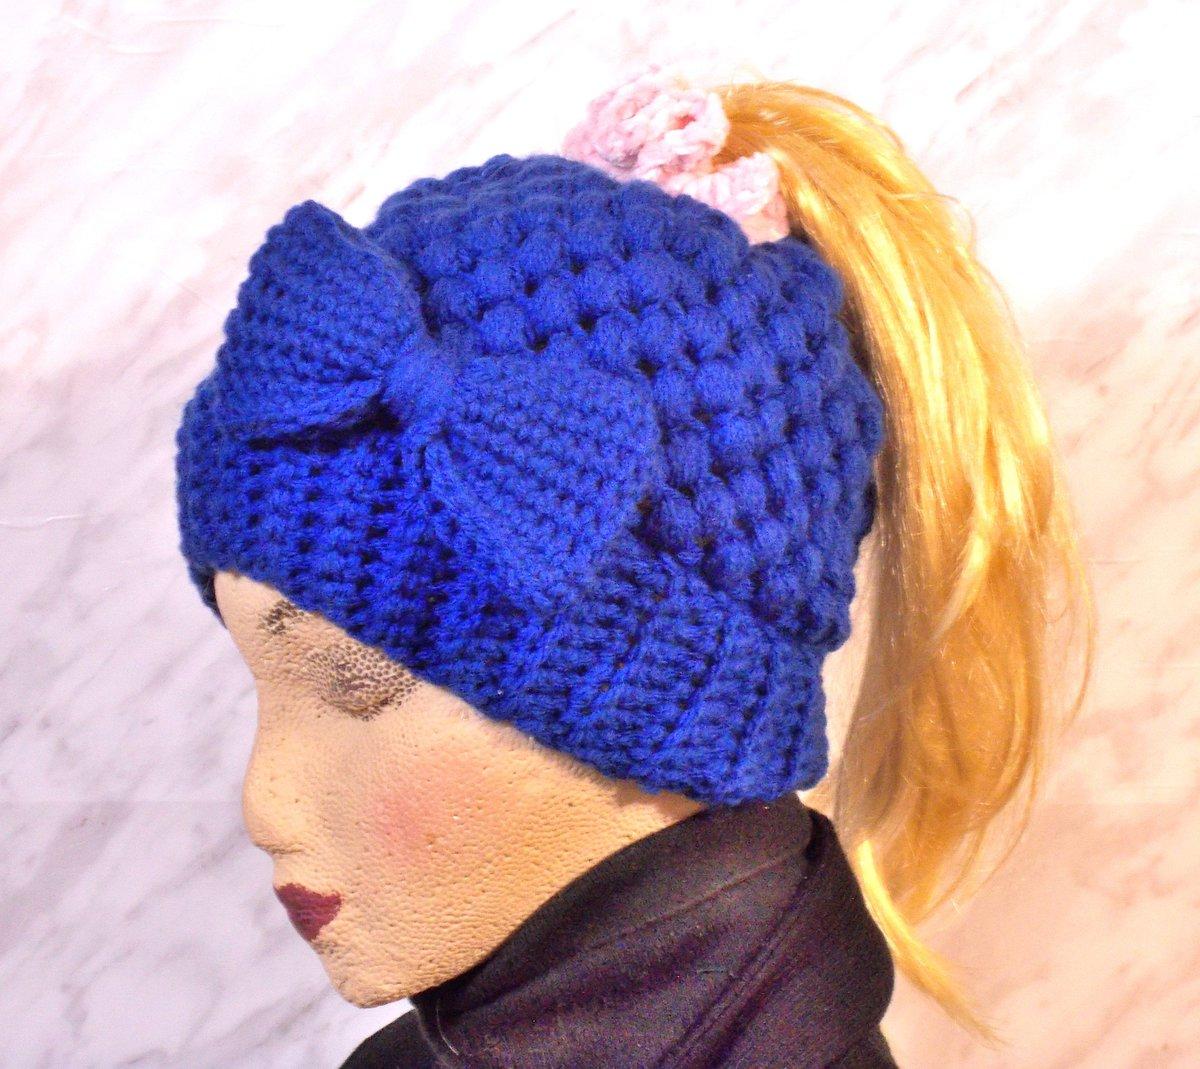 Excited to share the latest addition to my #etsy shop: Messy Bun Beanie, Womens Claire Bun Beanie, Messy Bun Hat,  #accessories #hat #blue #hatsandcaps #winterhats #messybunbeanie #messybunhat #ponytailhat #clairebunbeanie